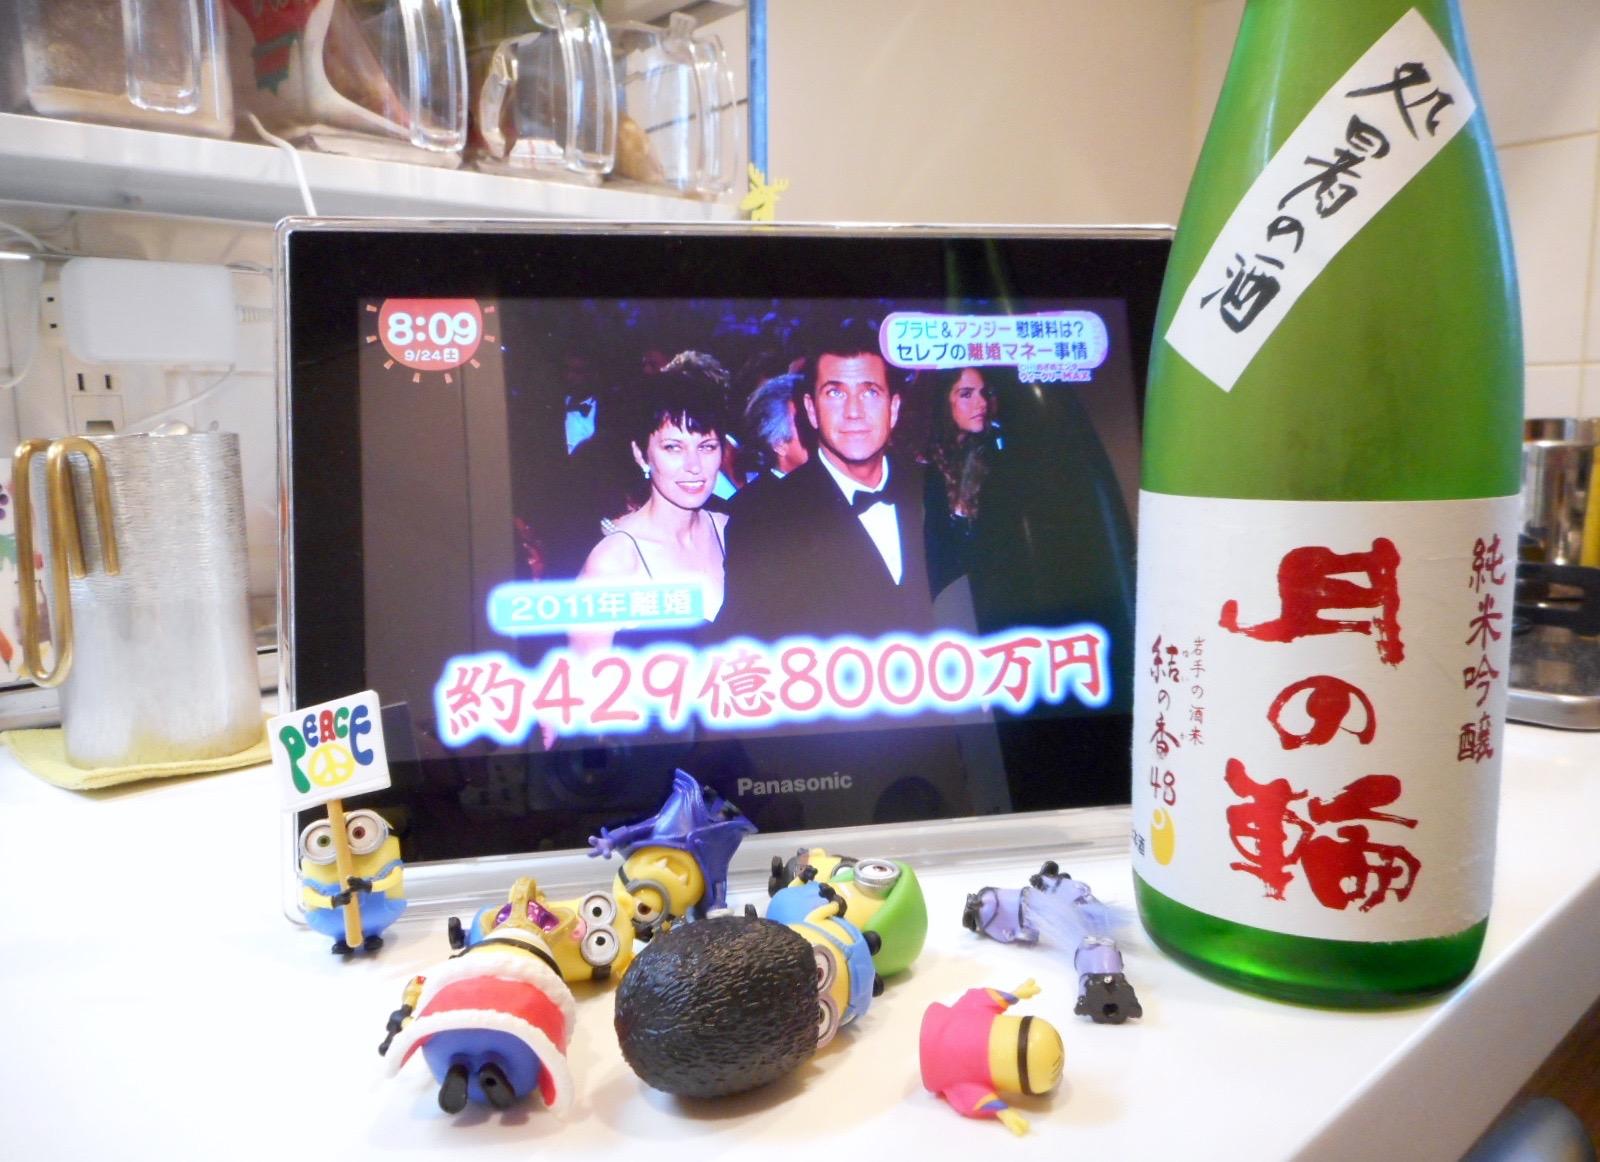 tsukinowa_yuinoka48_27by1.jpg